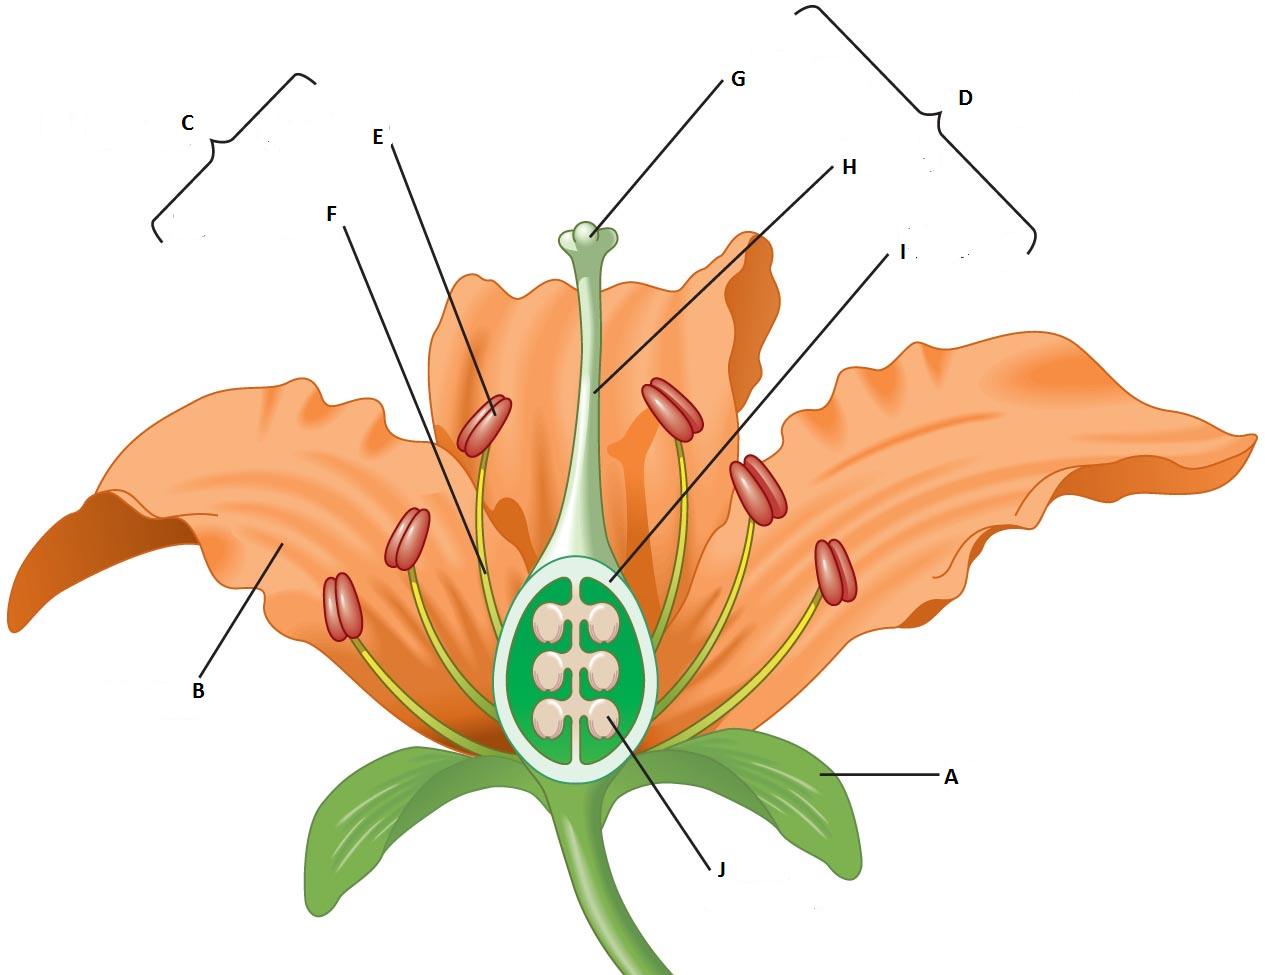 diagram quiz on flower parts biology multiple choice quizzes png 1265x975 unlabeled pollination diagram [ 1265 x 975 Pixel ]